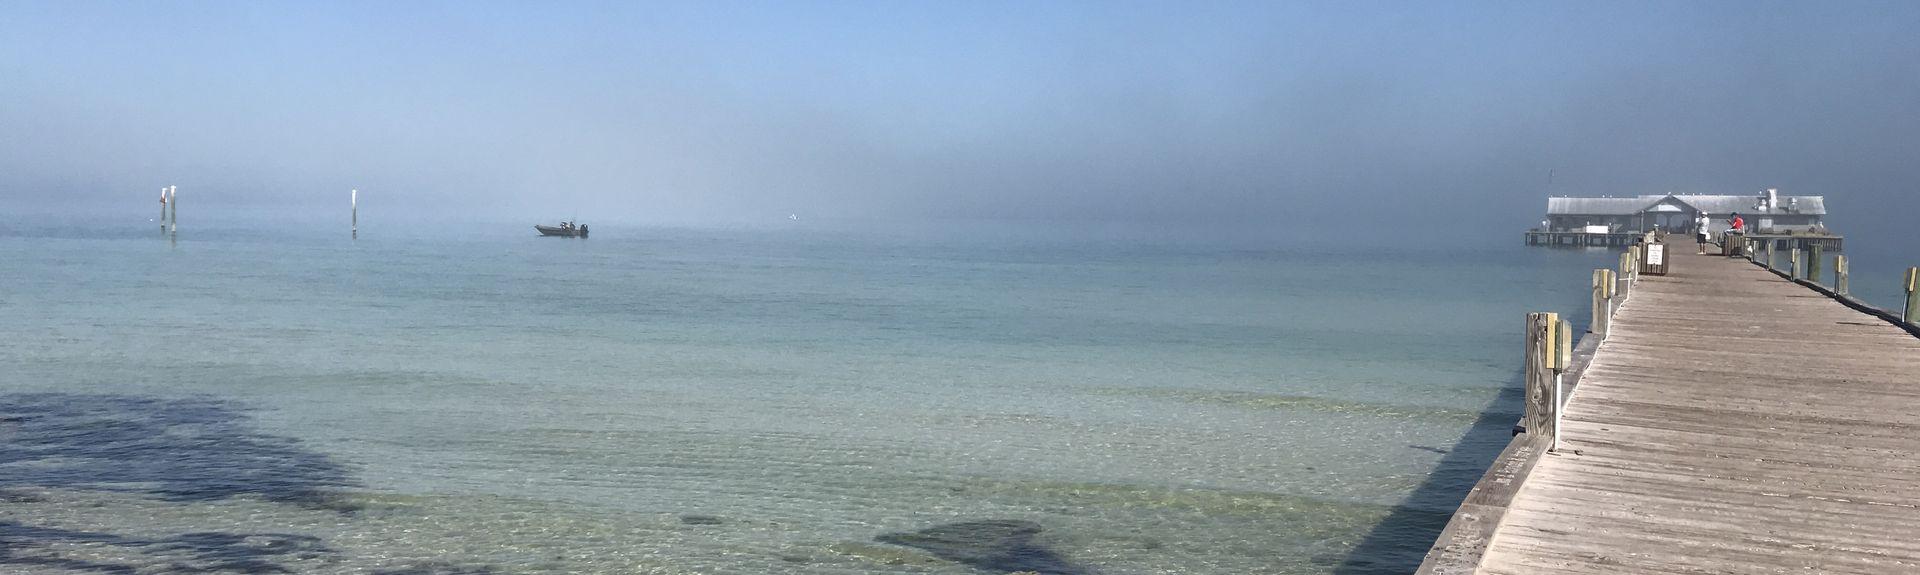 Siesta Key Marina, Siesta Key, FL, USA